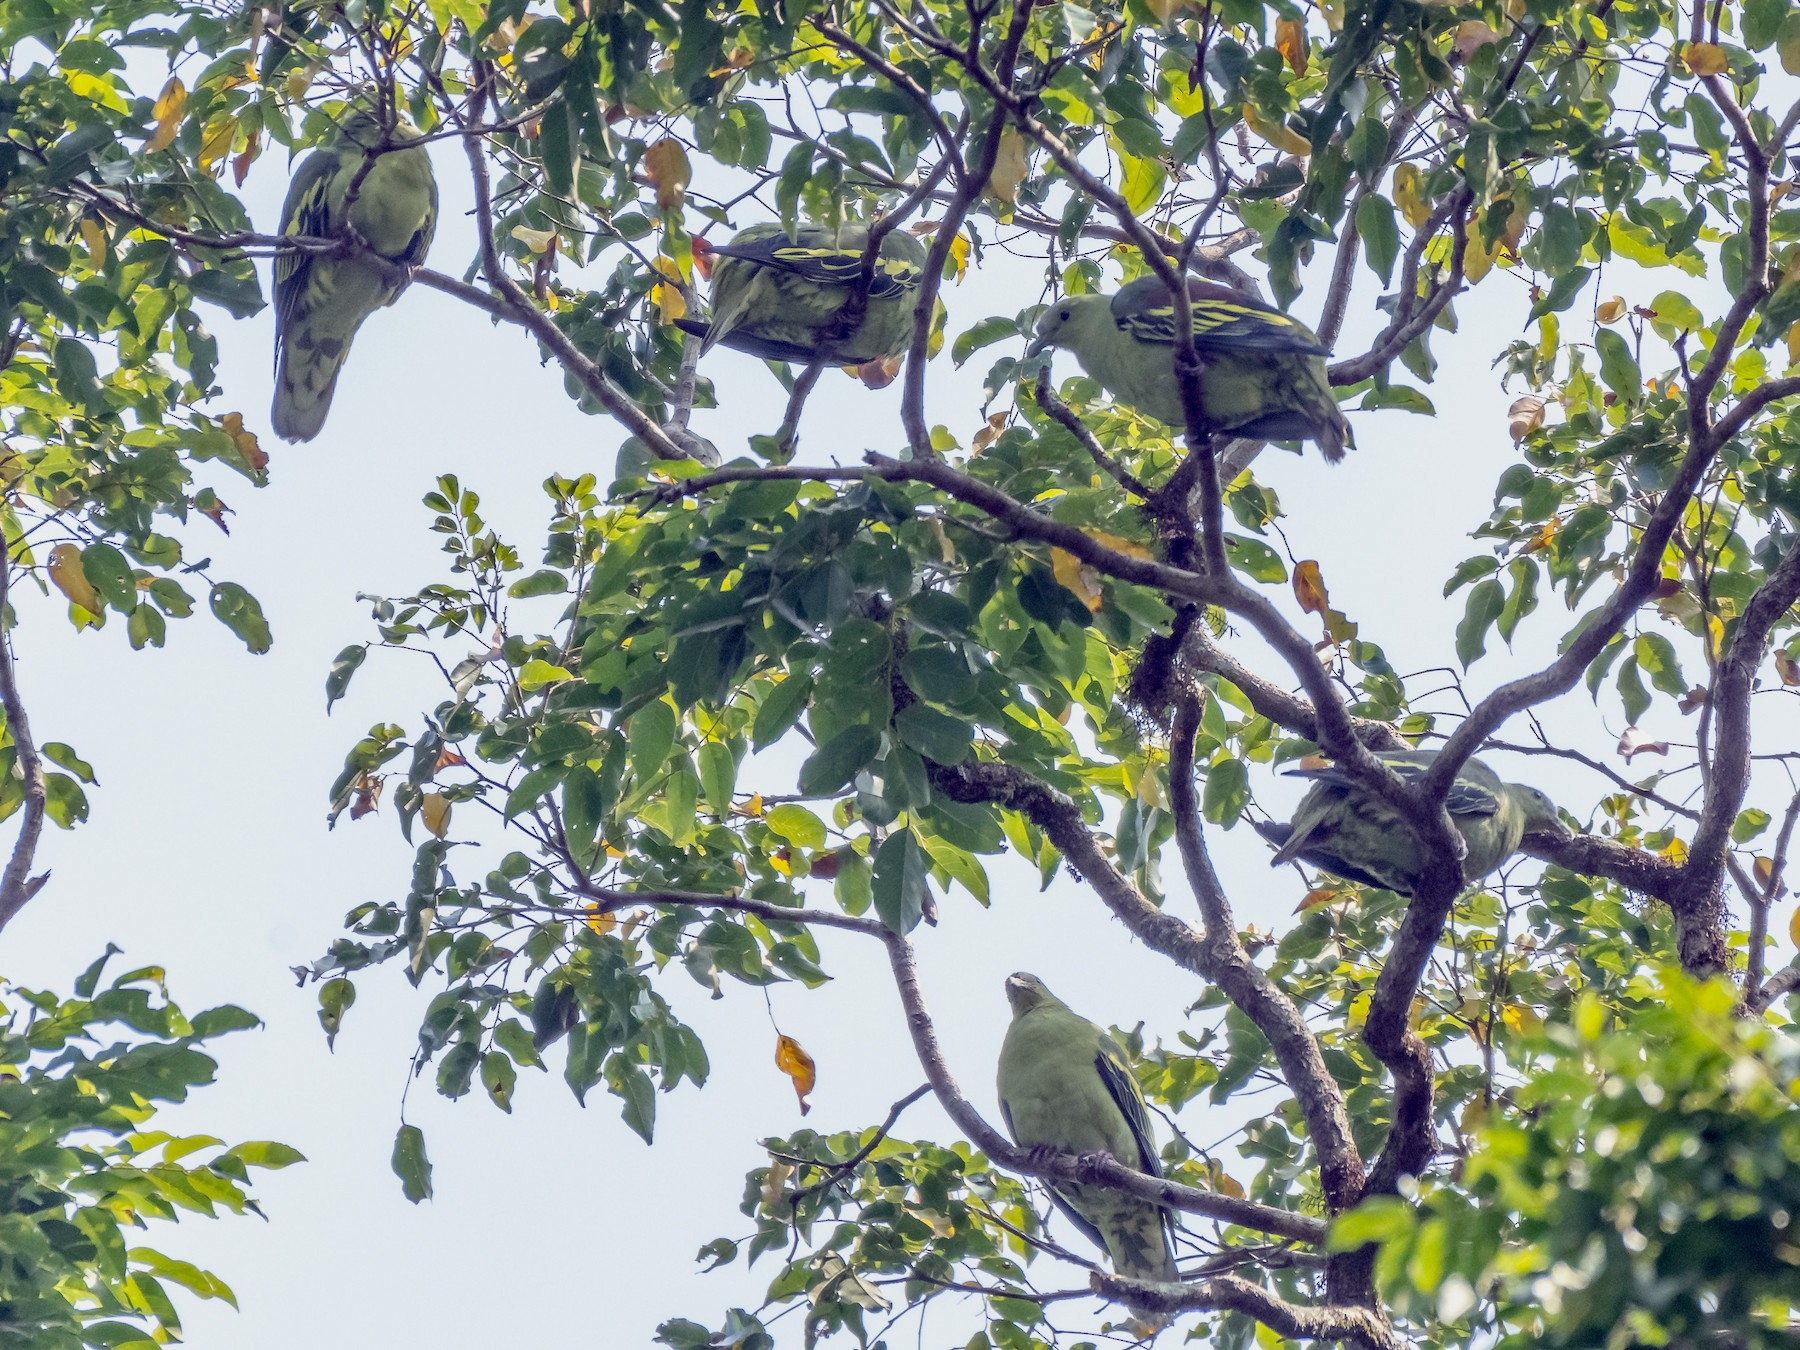 Andaman Green-Pigeon - Balaji P B